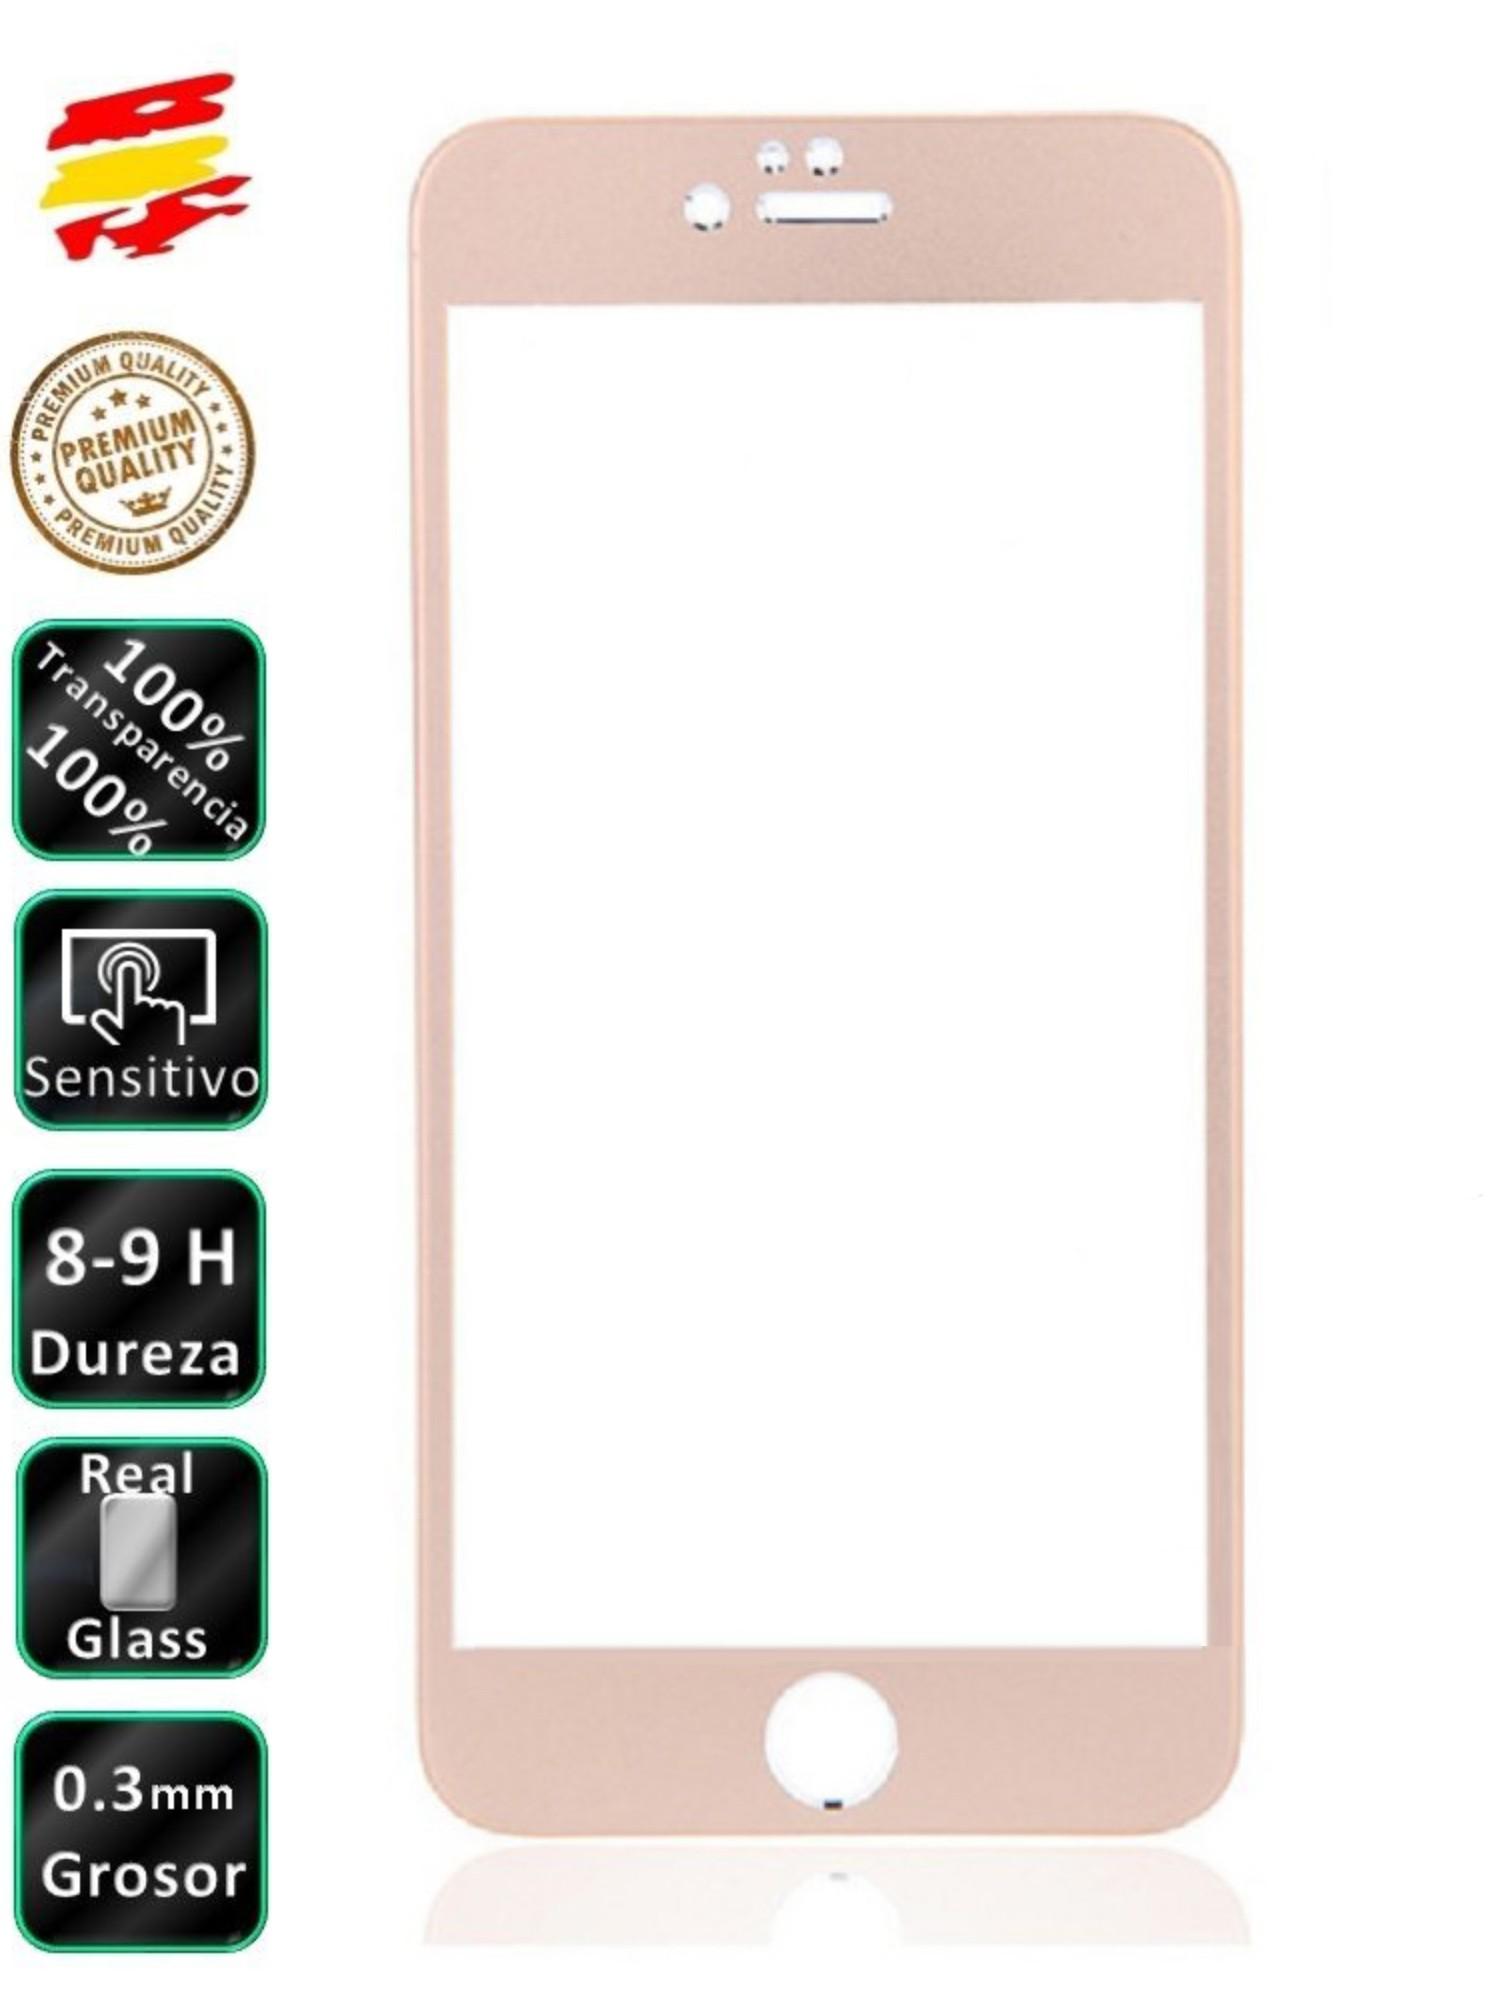 Apple protetora iphone 6 s plus 5.5 cor dourada 3d tela cheia temperado